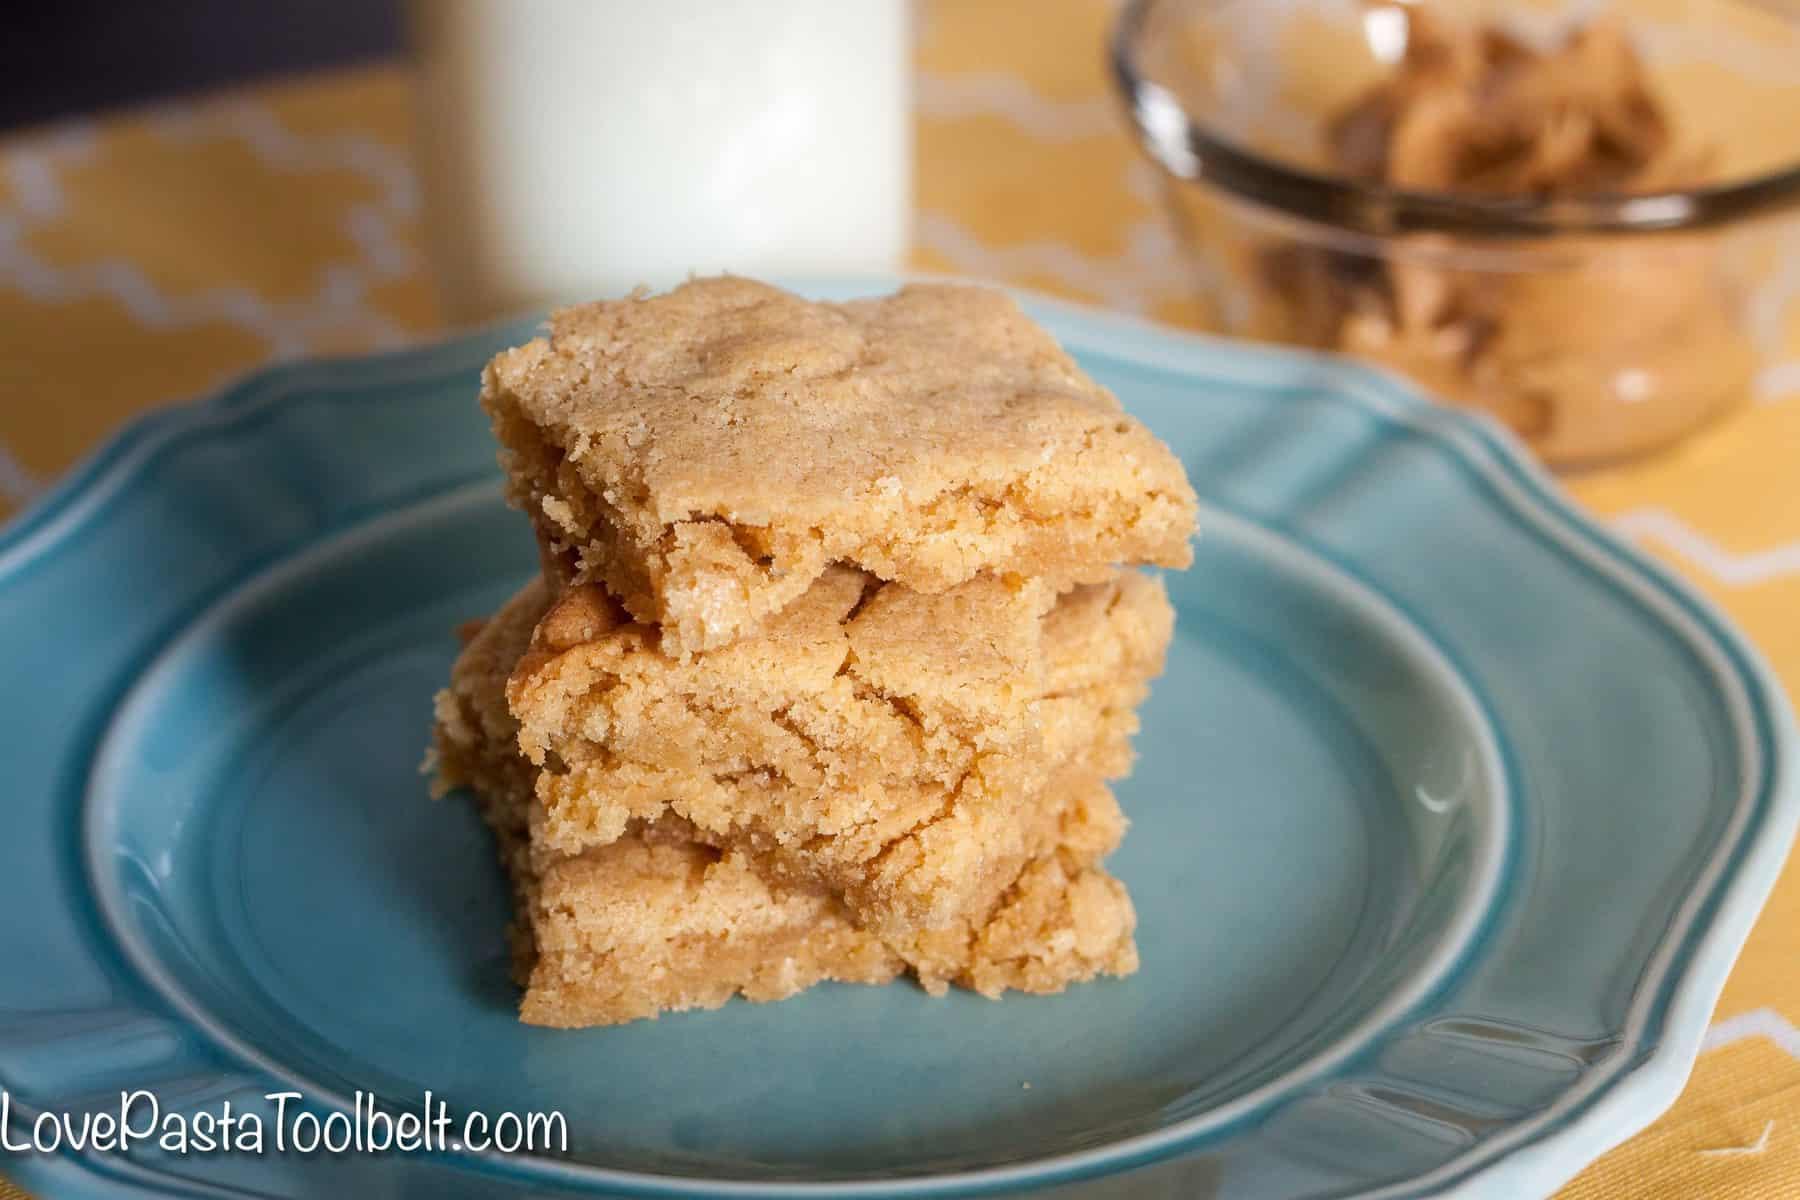 Easy to make peanut butter dessert recipes